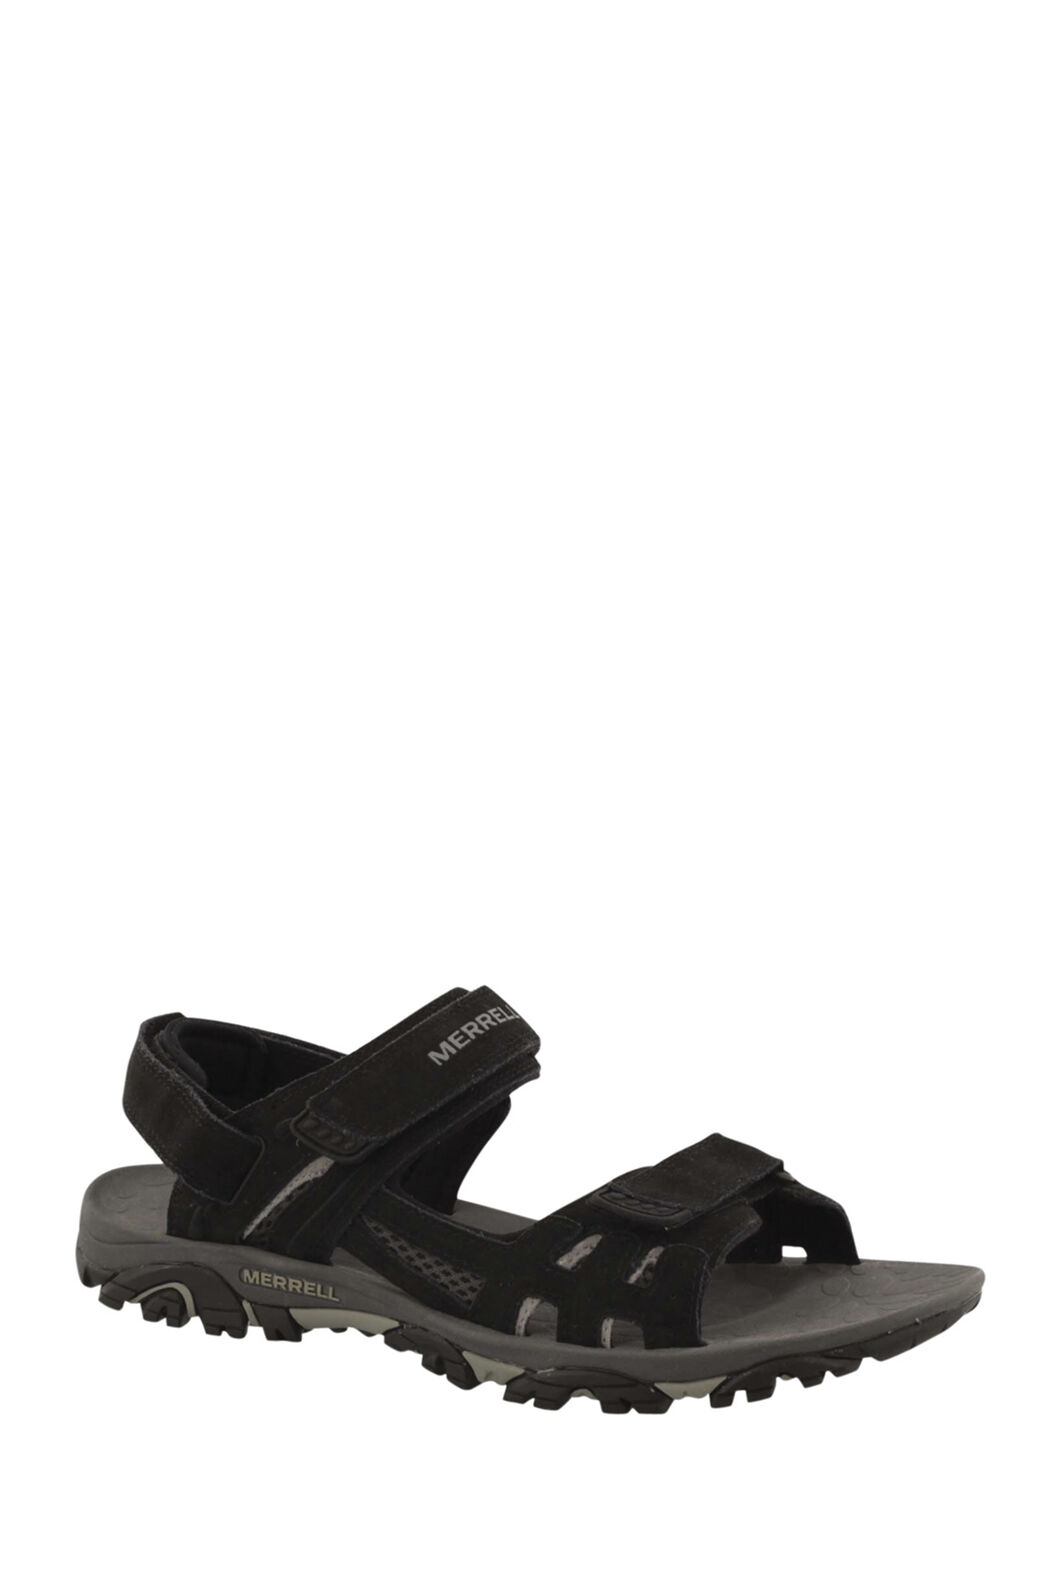 Merrell Men's Moab Drift Strap Sandals, Black, hi-res